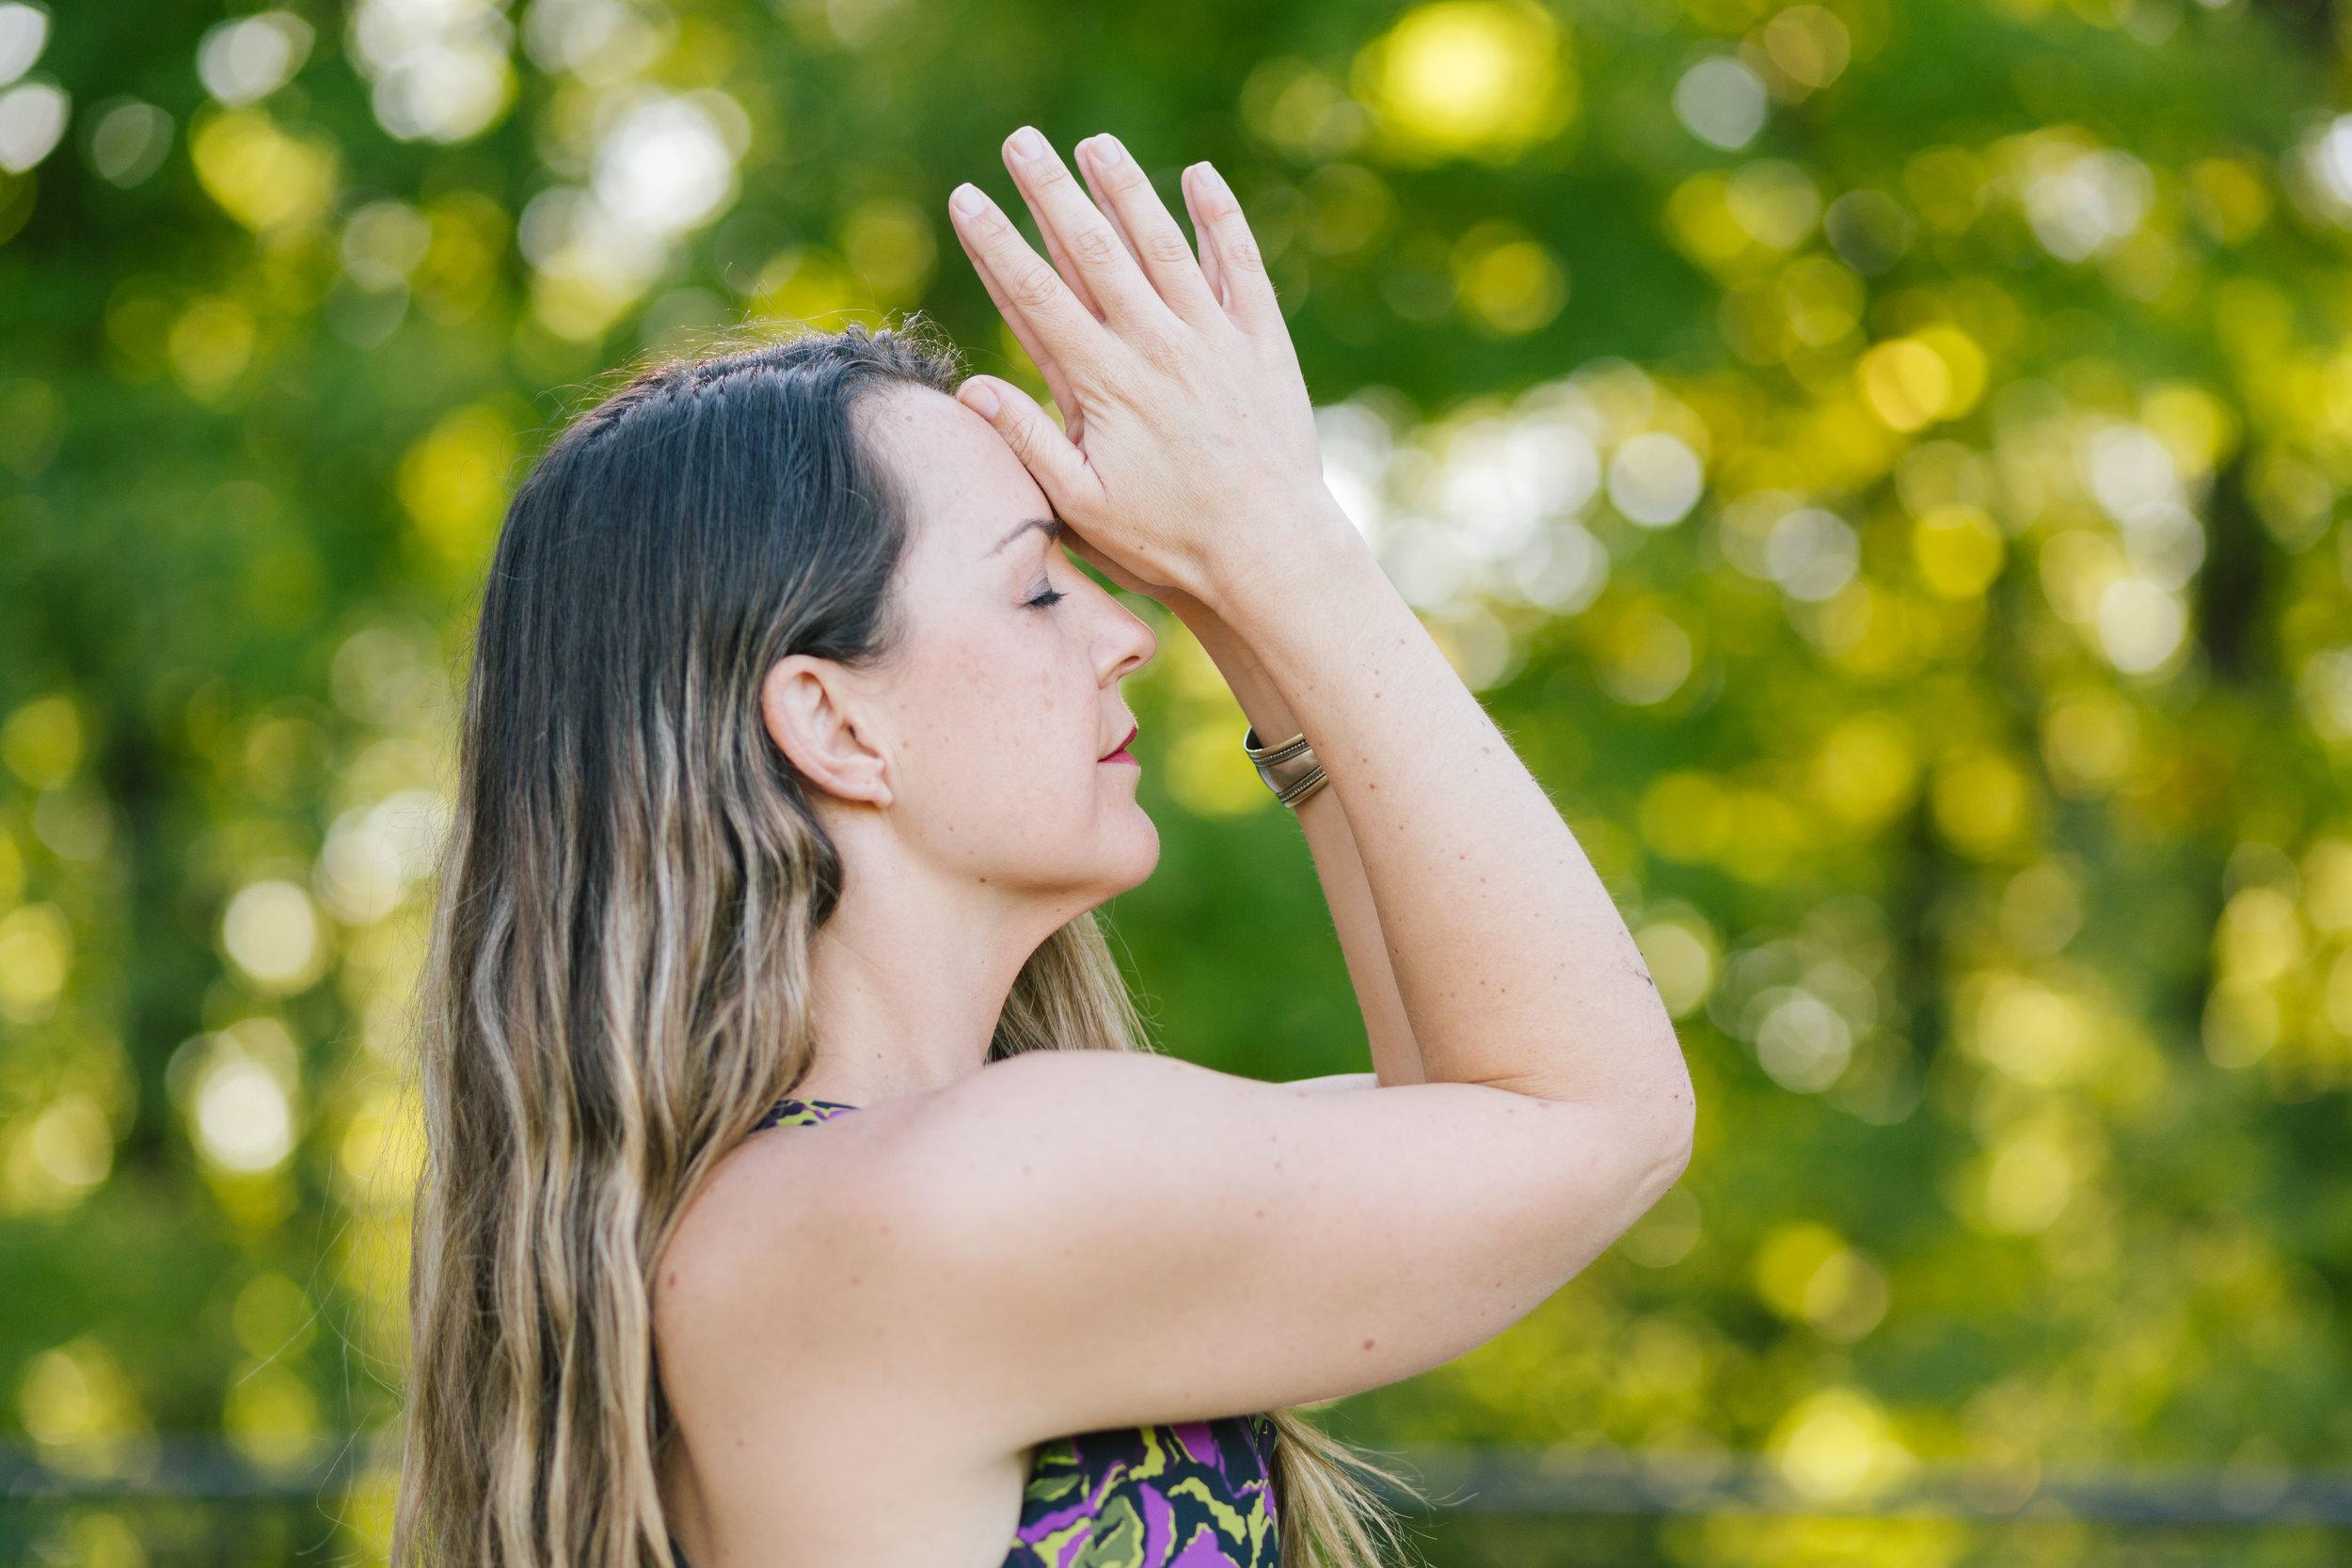 Shannon s Yoga Mini Session October 2016-Shannon-0044.jpg